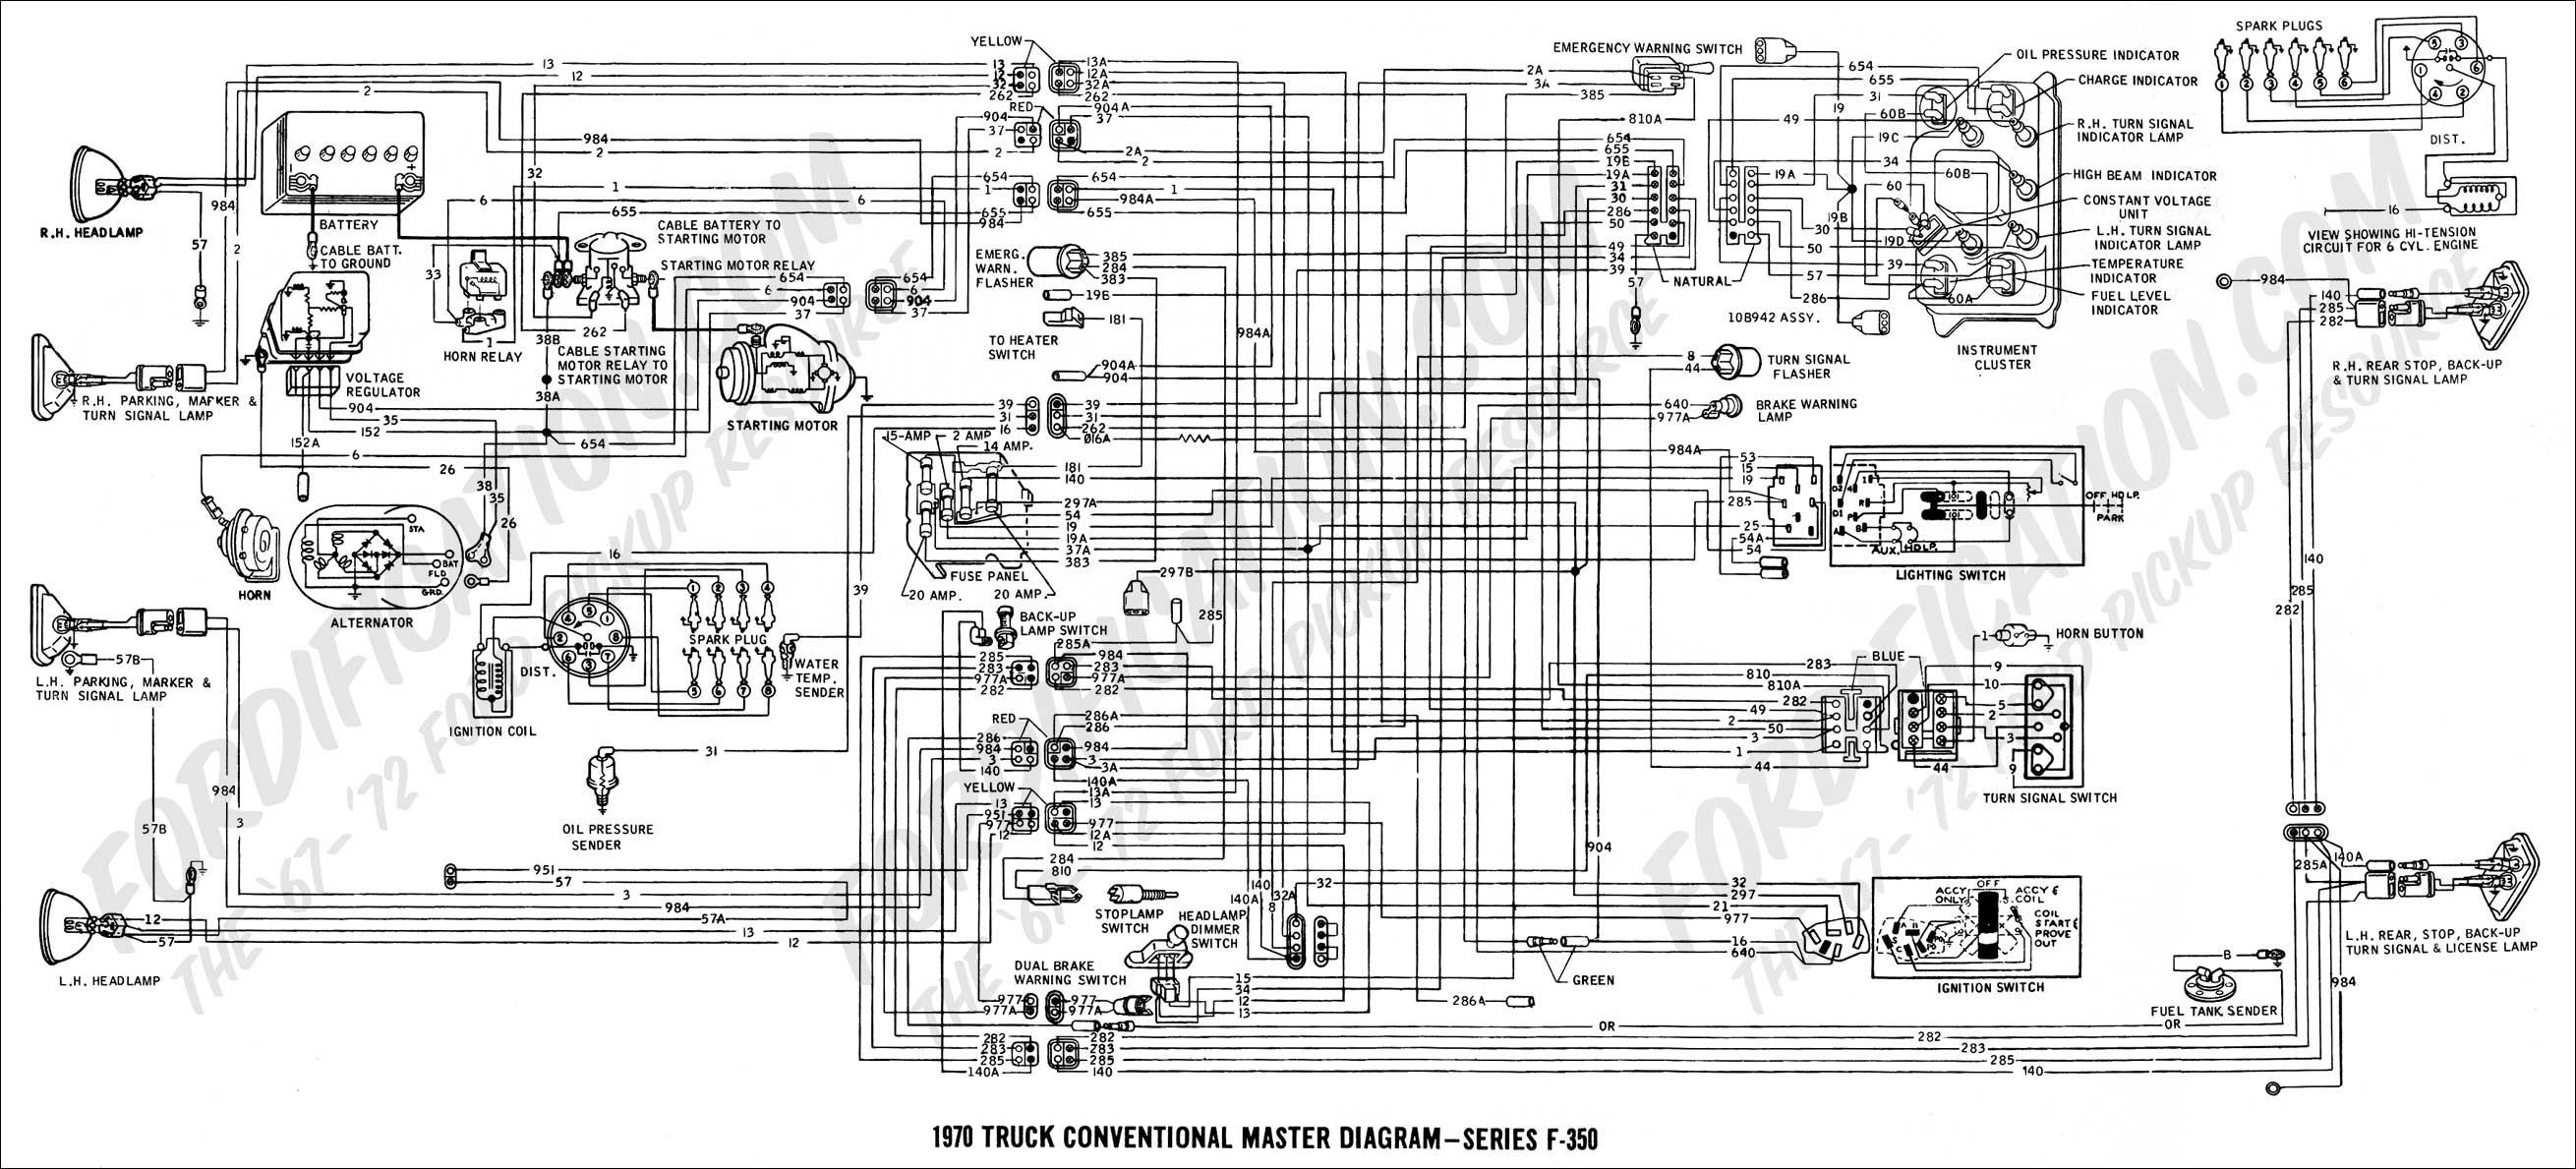 1995 Ford Truck Wiring Diagram - Wiring Diagram